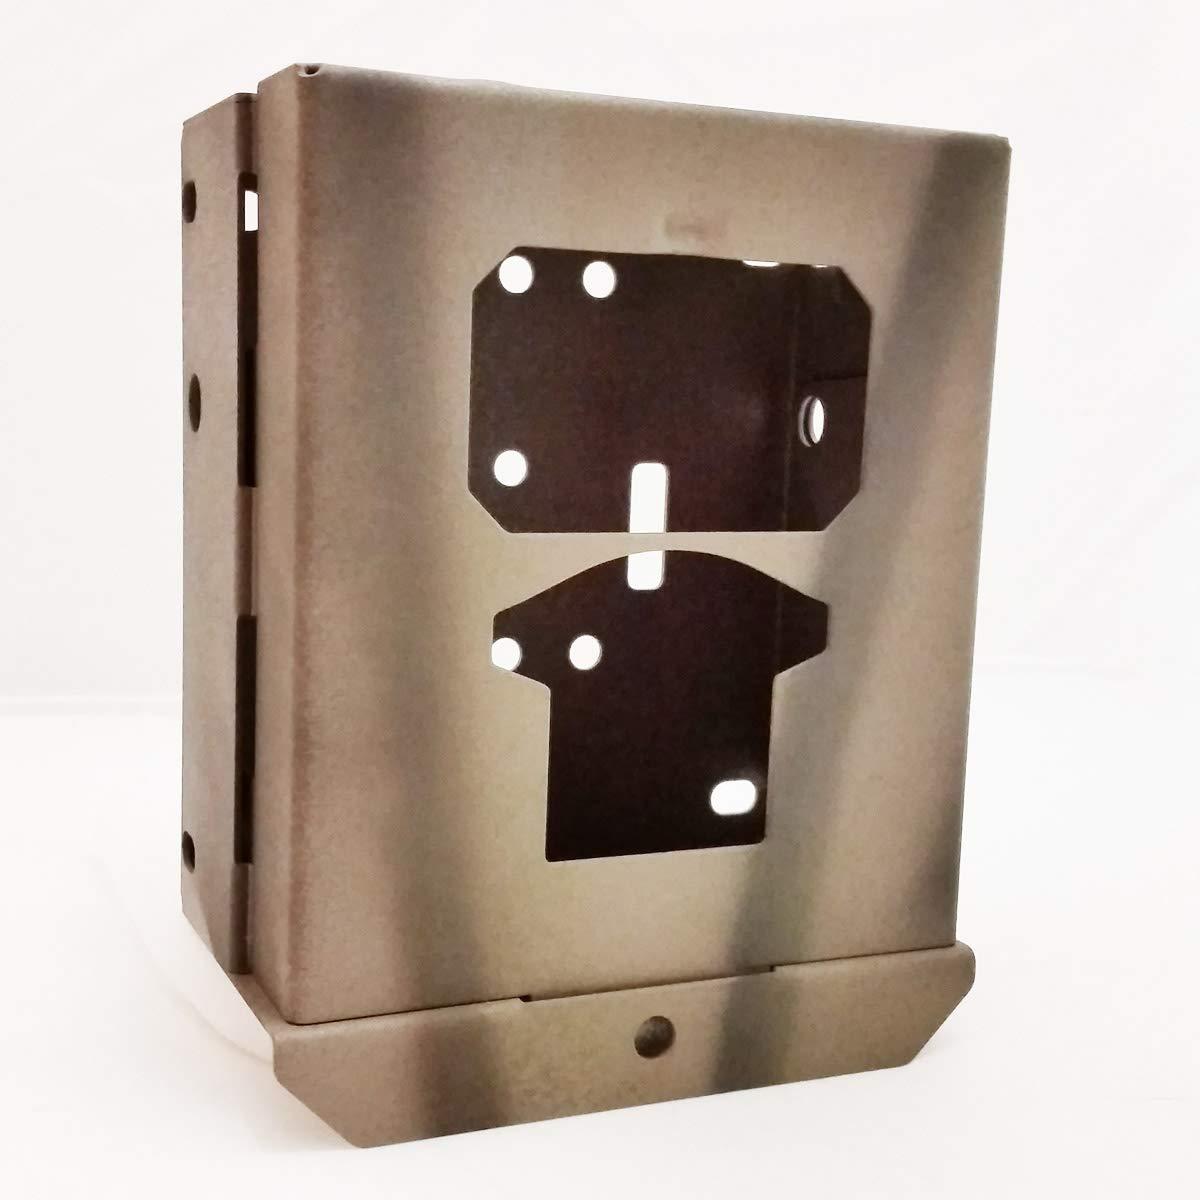 Camlockbox Compatible with HCO Spartan Go Cam Models in Description by CAMLOCKbox